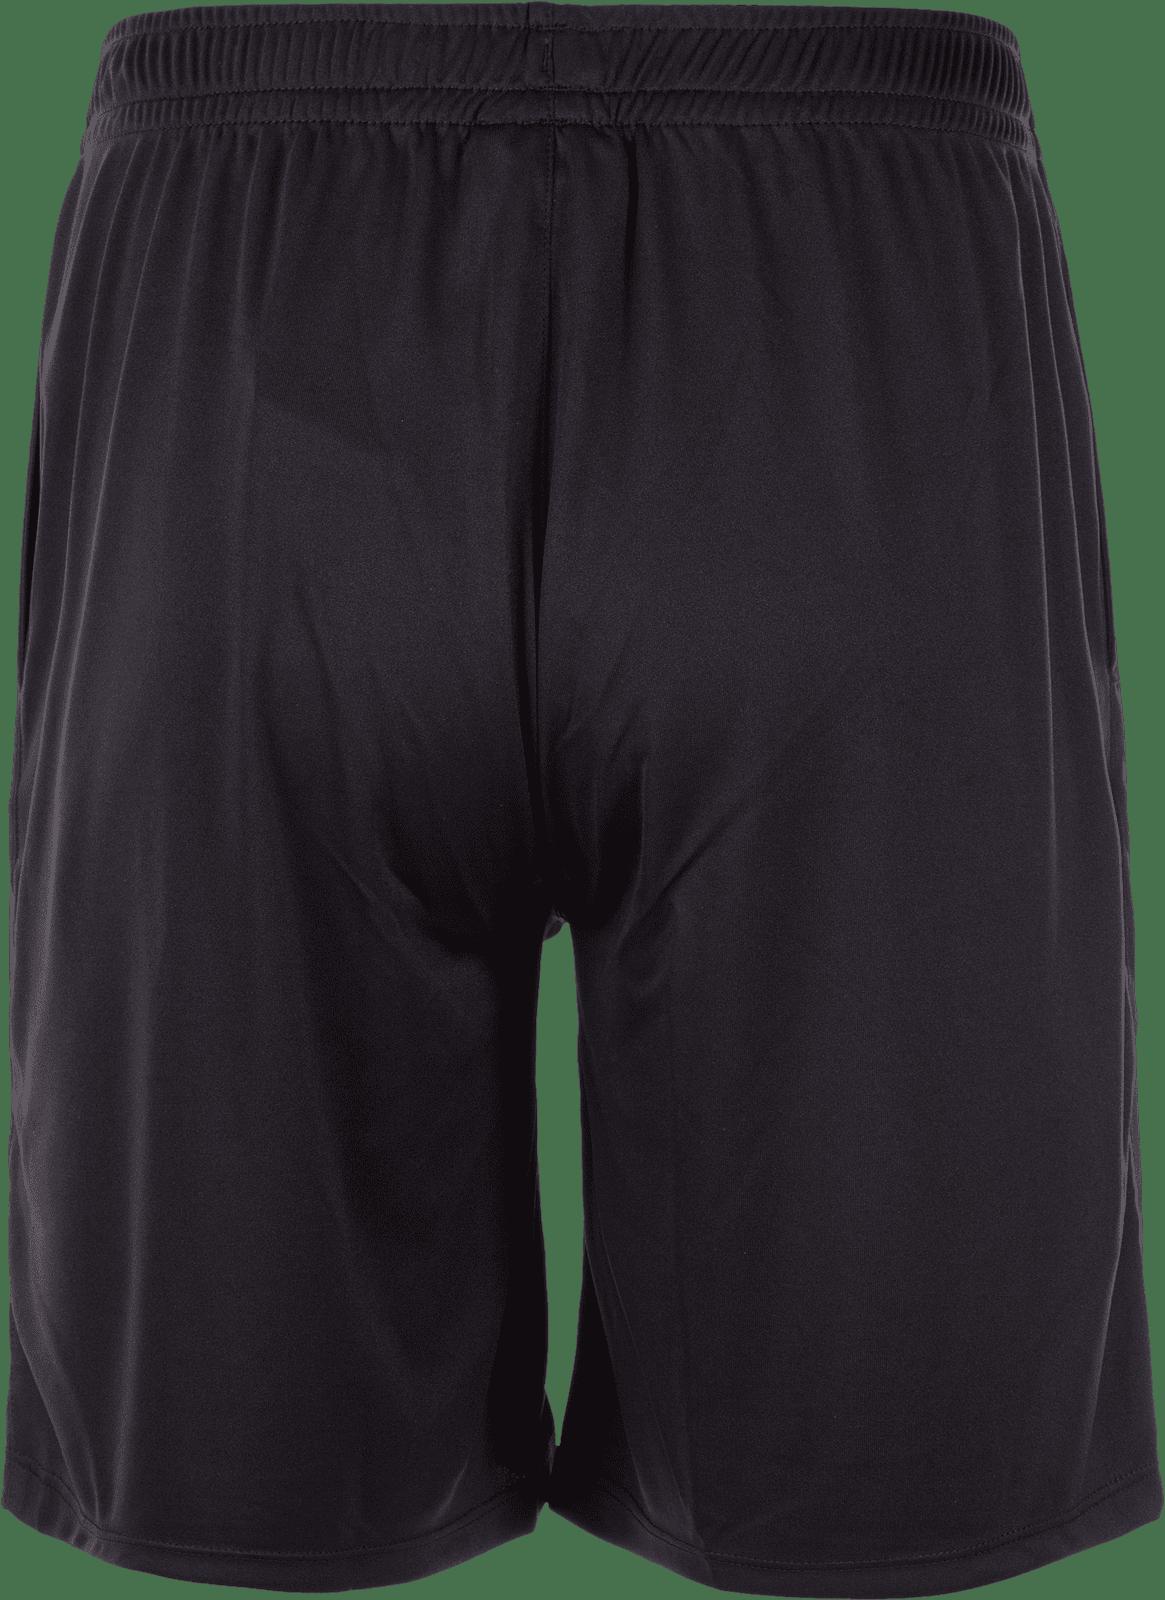 Forza Landers Jr. Shorts, 96 Black